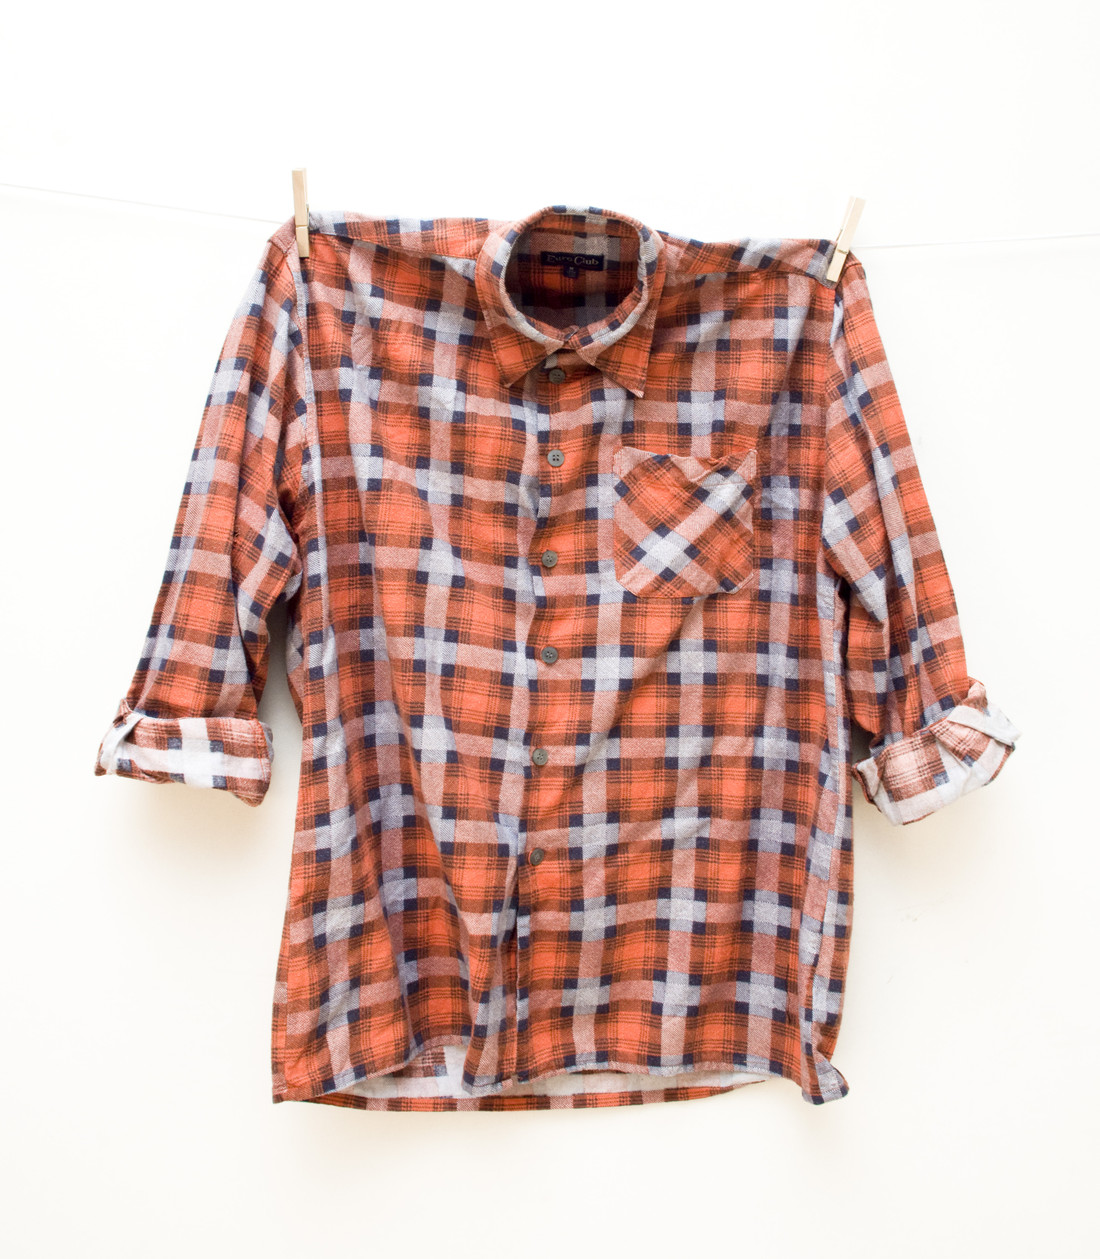 Orange shirt - Pop Sick Vintage